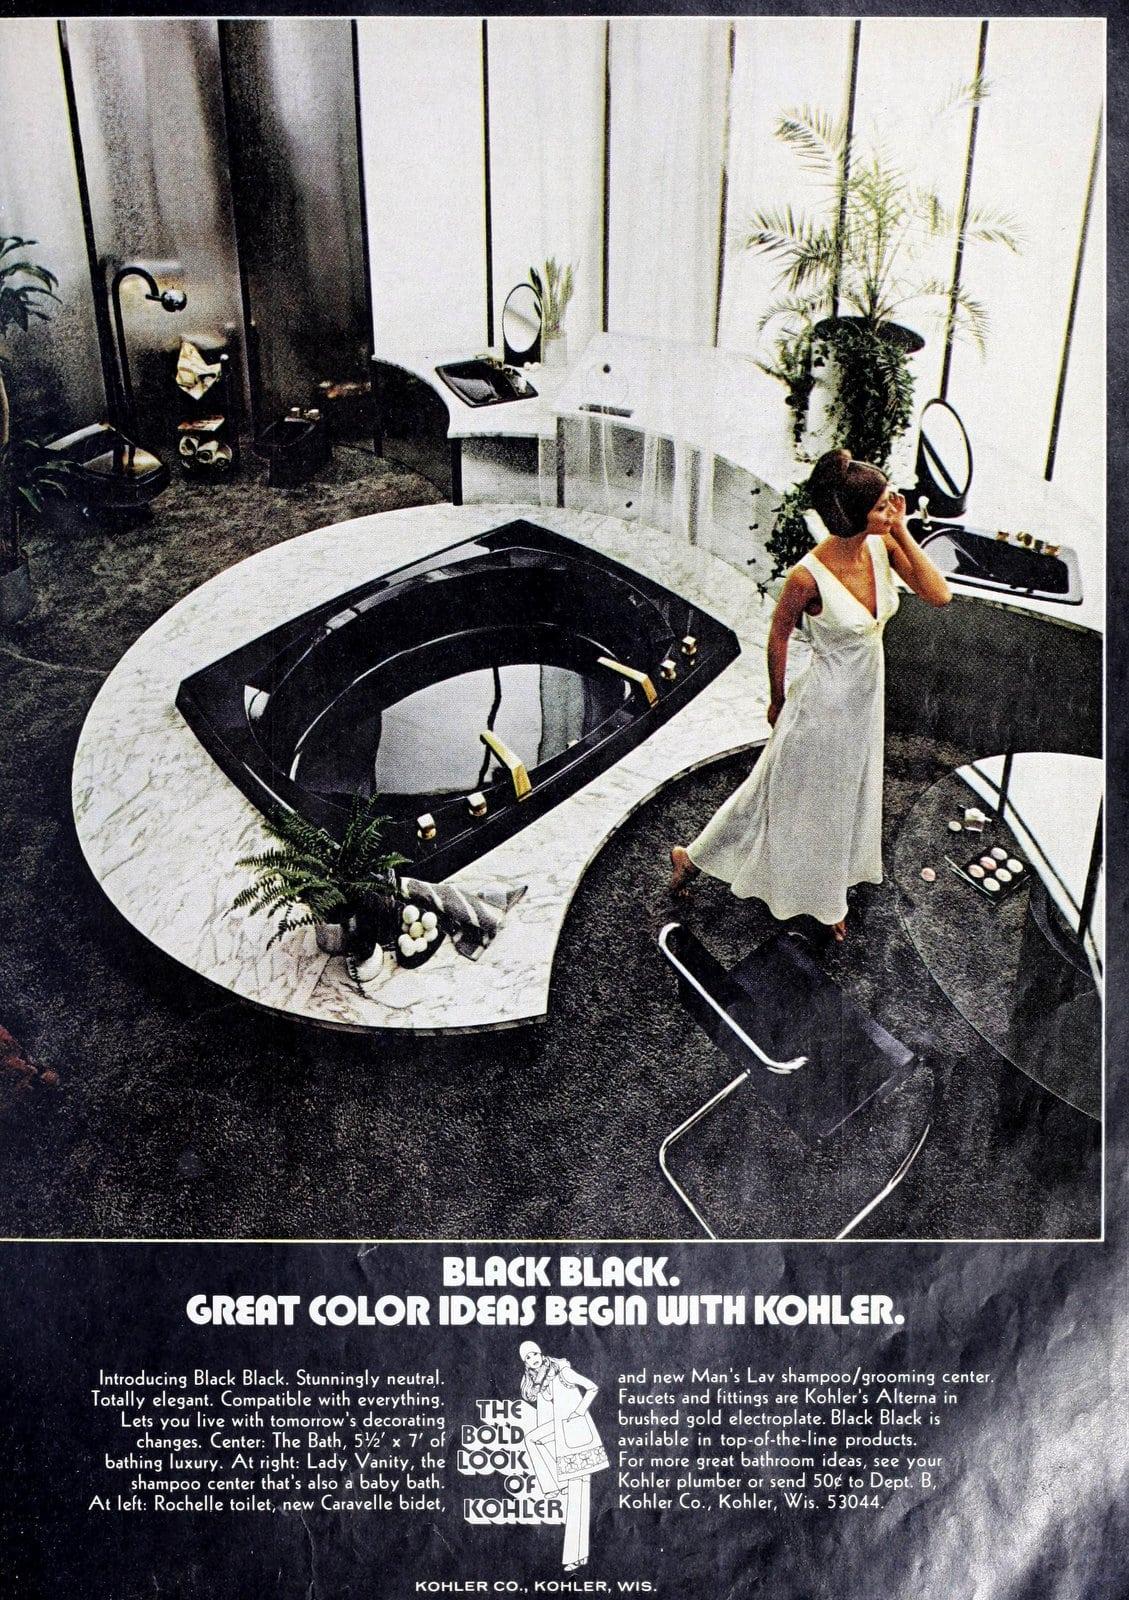 Black Black Kohler bathroom suite (1972)